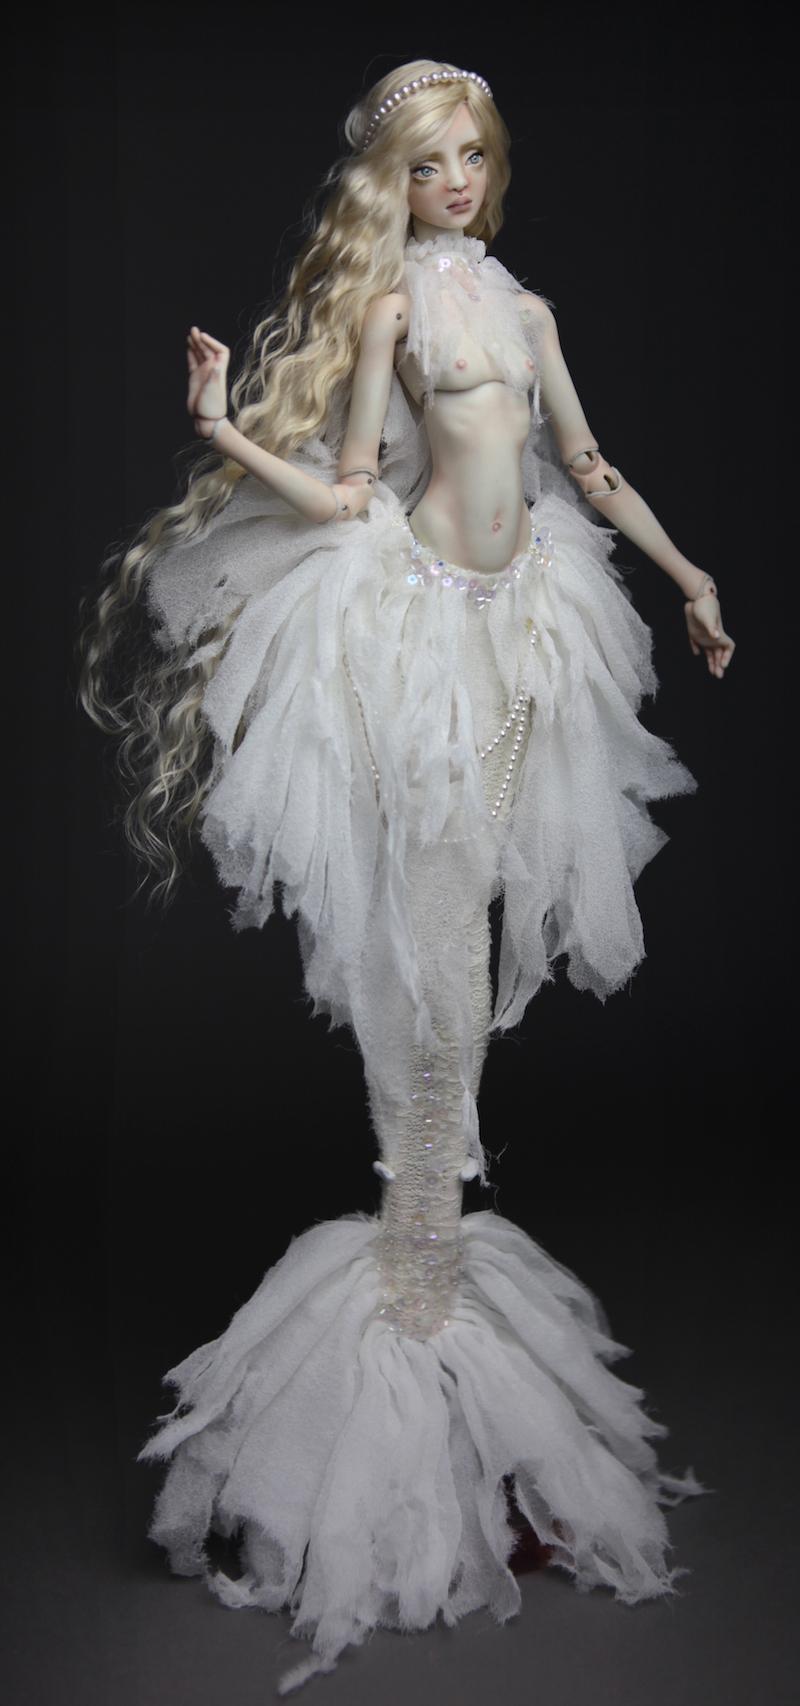 BJD Doll Ball Jointed Tattoed Baroque Sphinx 2 15 Porcelain BJD Doll   White Betta Mermaid Luna